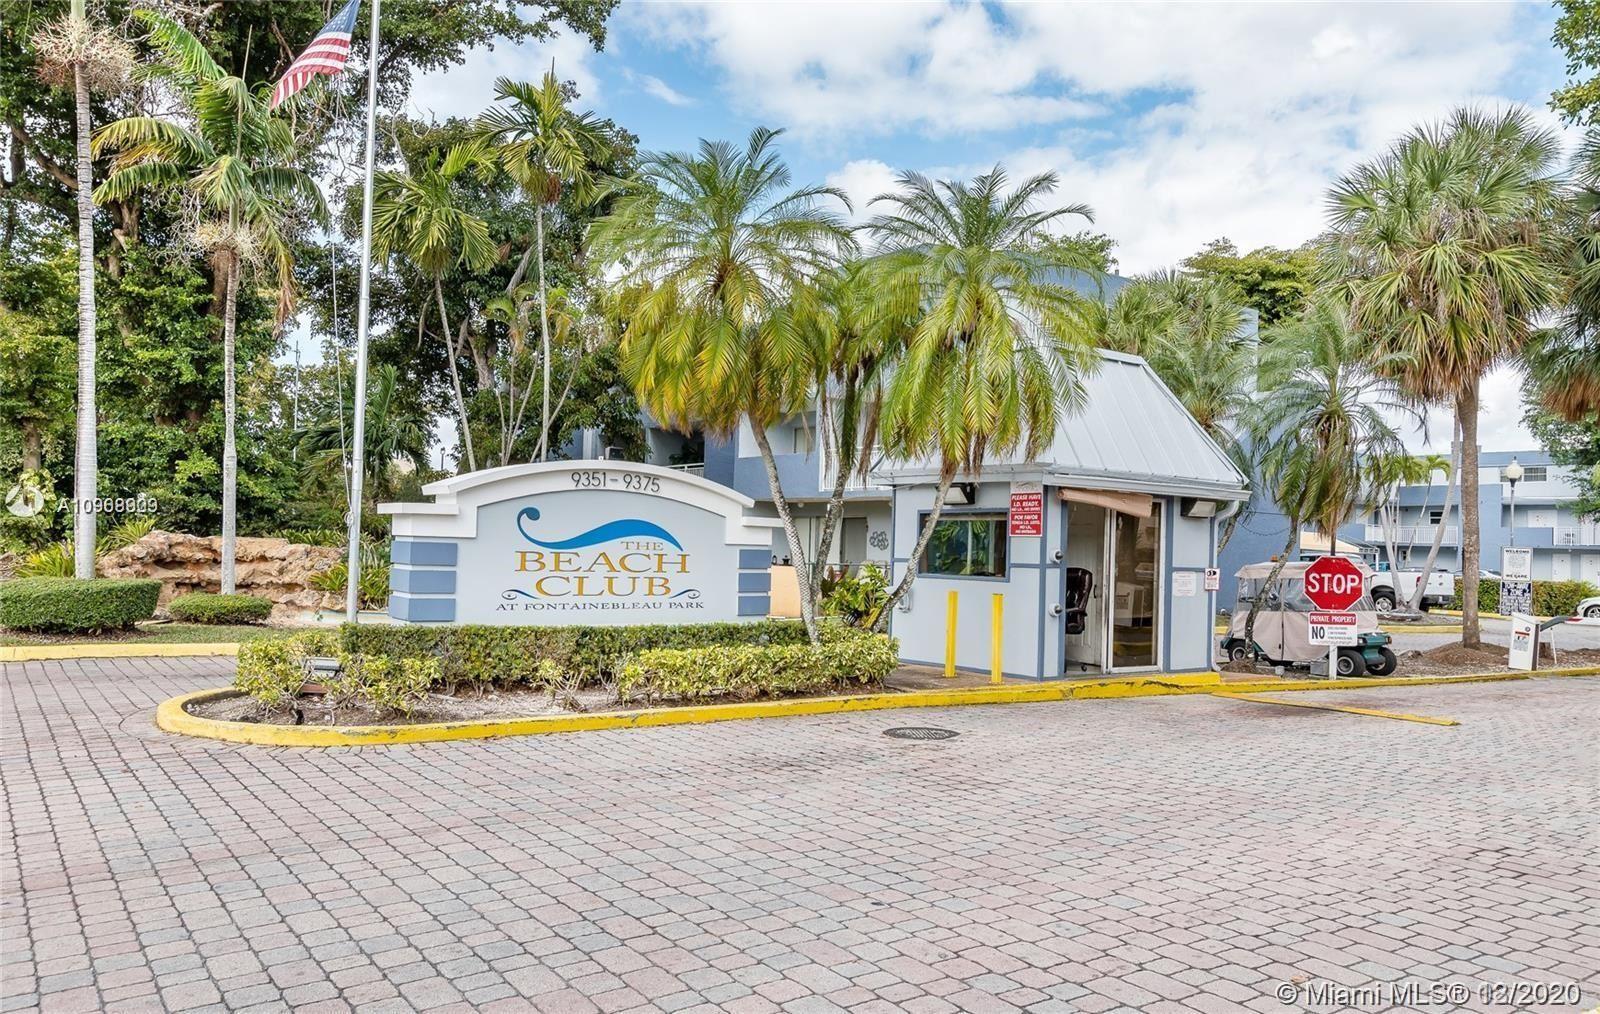 9351 Fontainebleau Blvd #B232, Miami, FL 33172 - #: A10968909